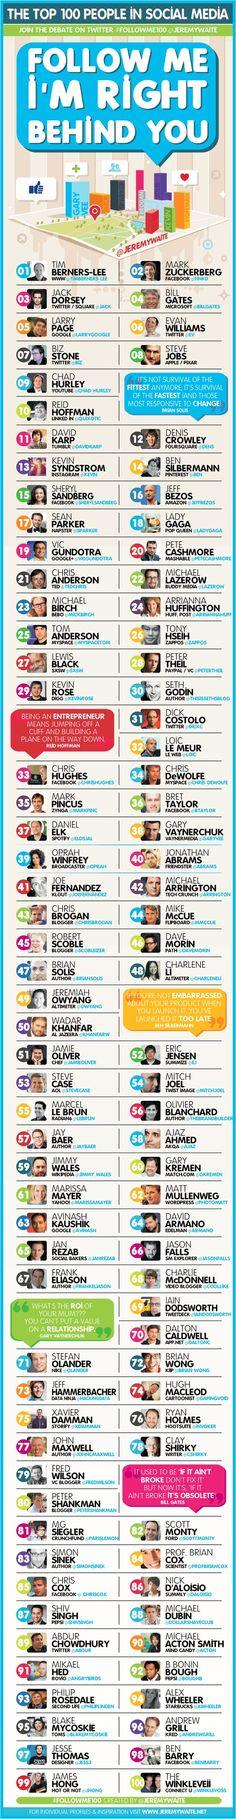 The Top 100 People in #SocialMedia to Follow